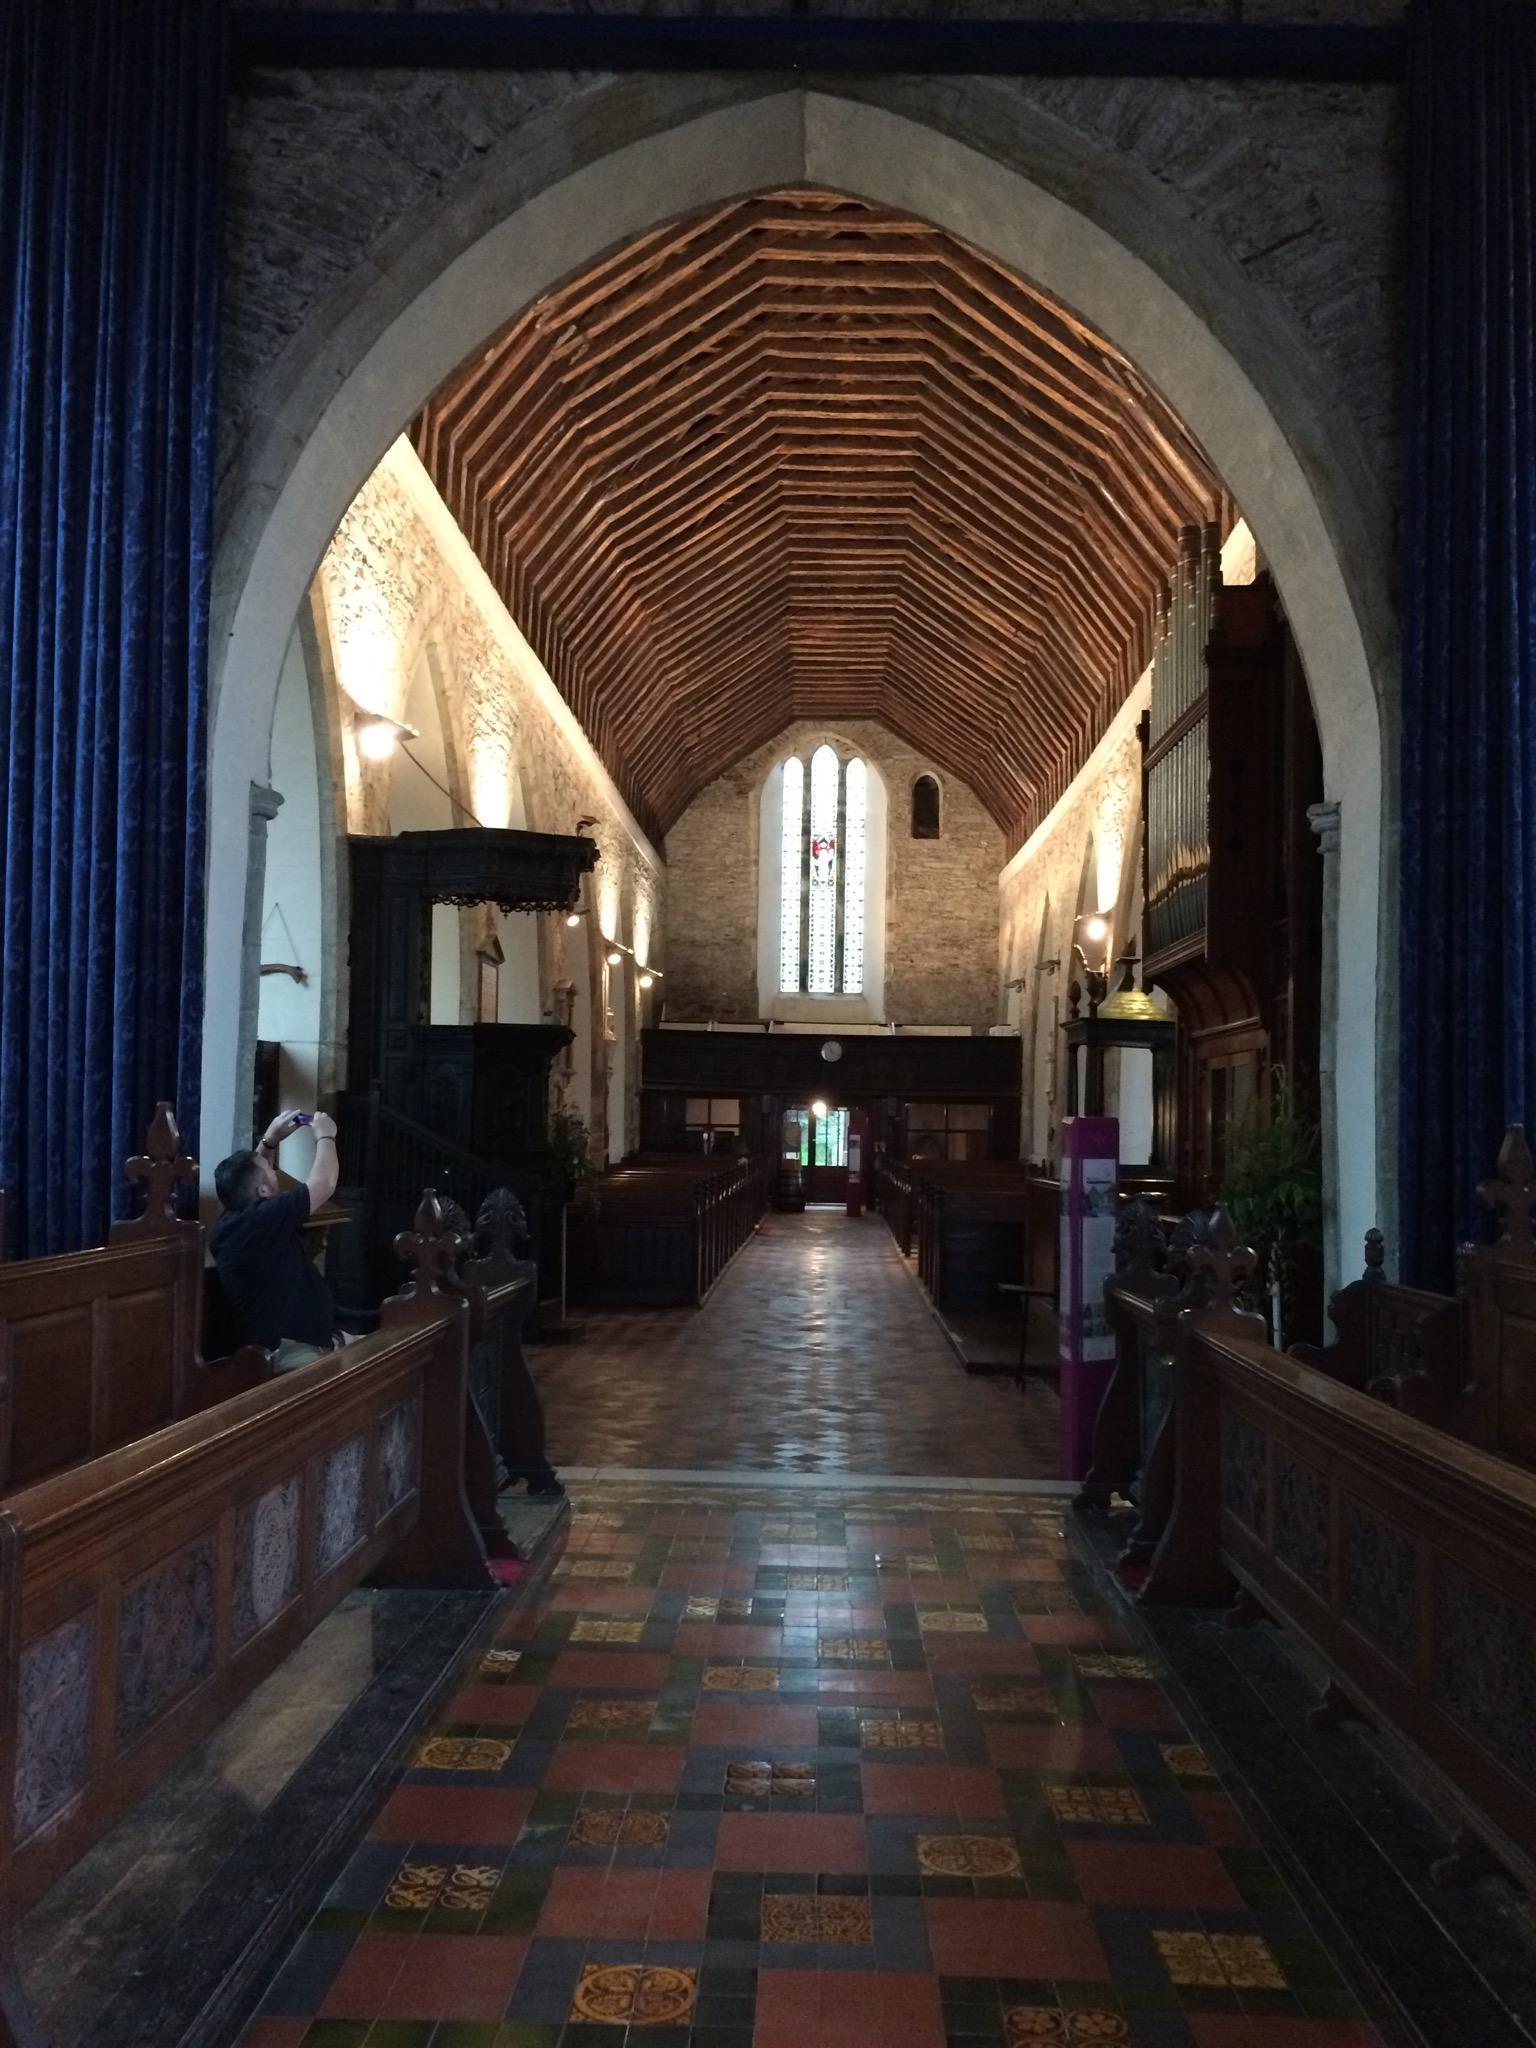 800 year old original ceiling